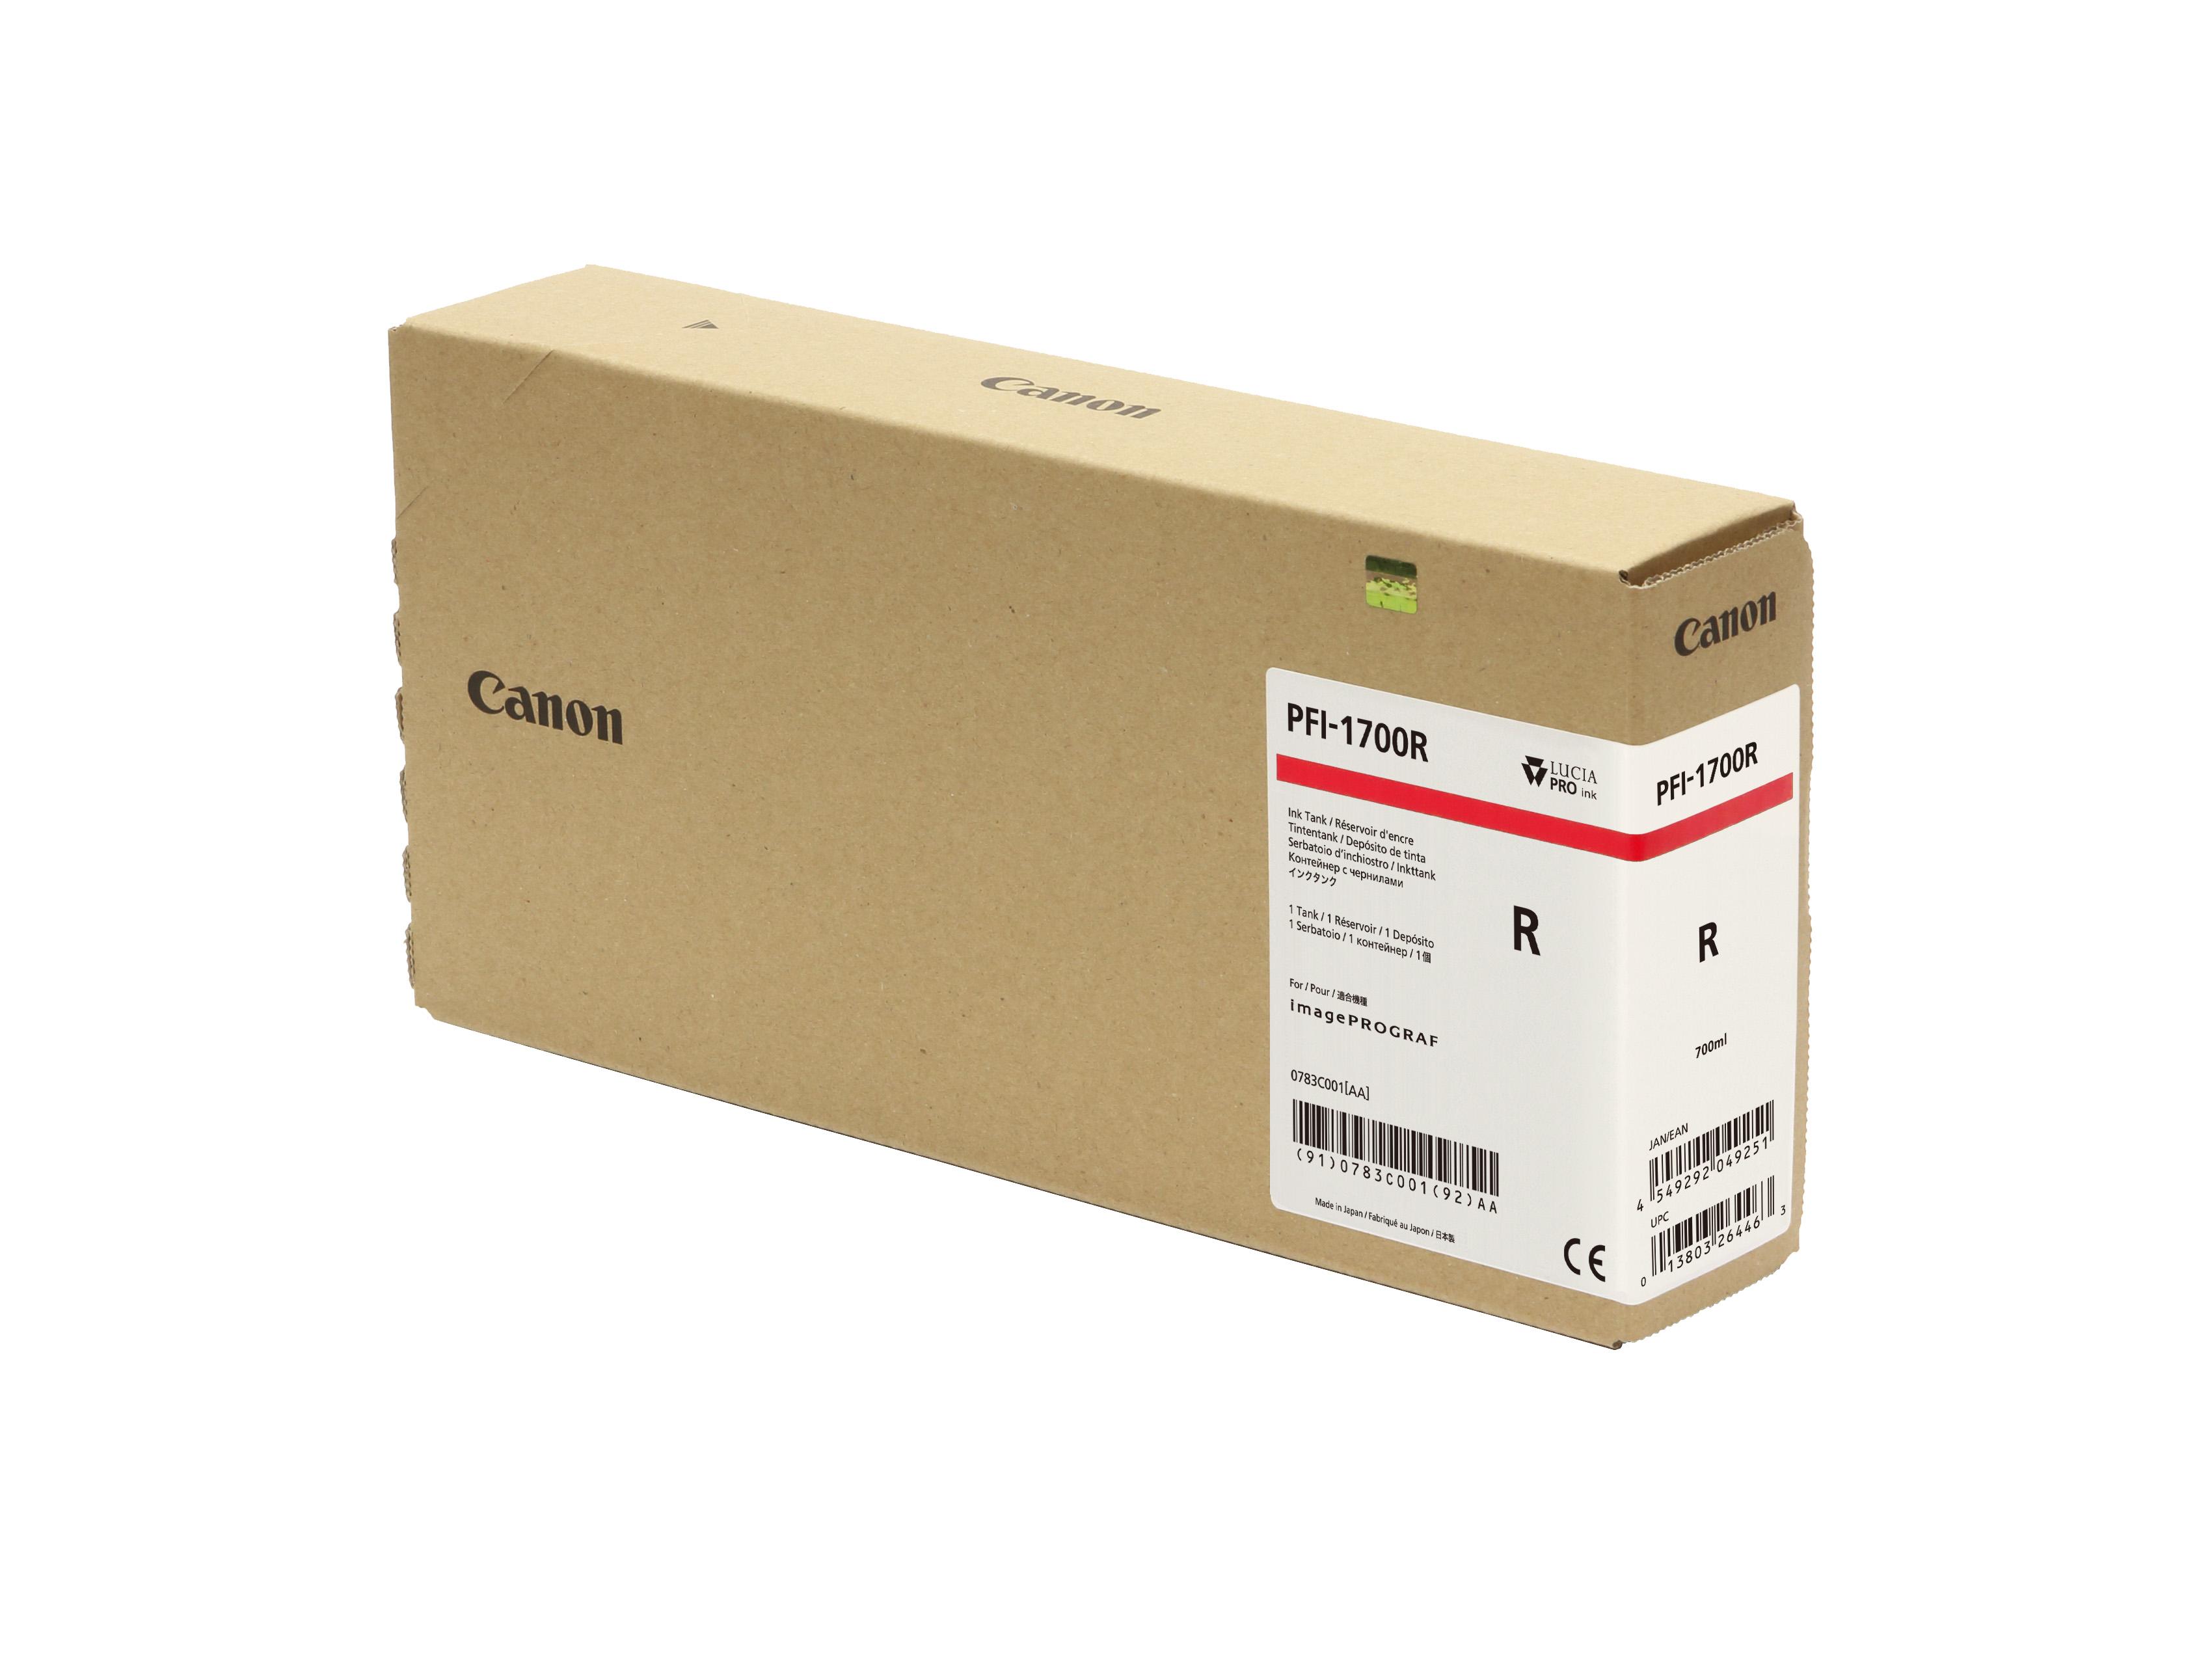 Canon PFI-1700R Red Ink Tank - 700ml Cartridge - for Canon PRO-2000, PRO-4000 Printers - 0783C001AA